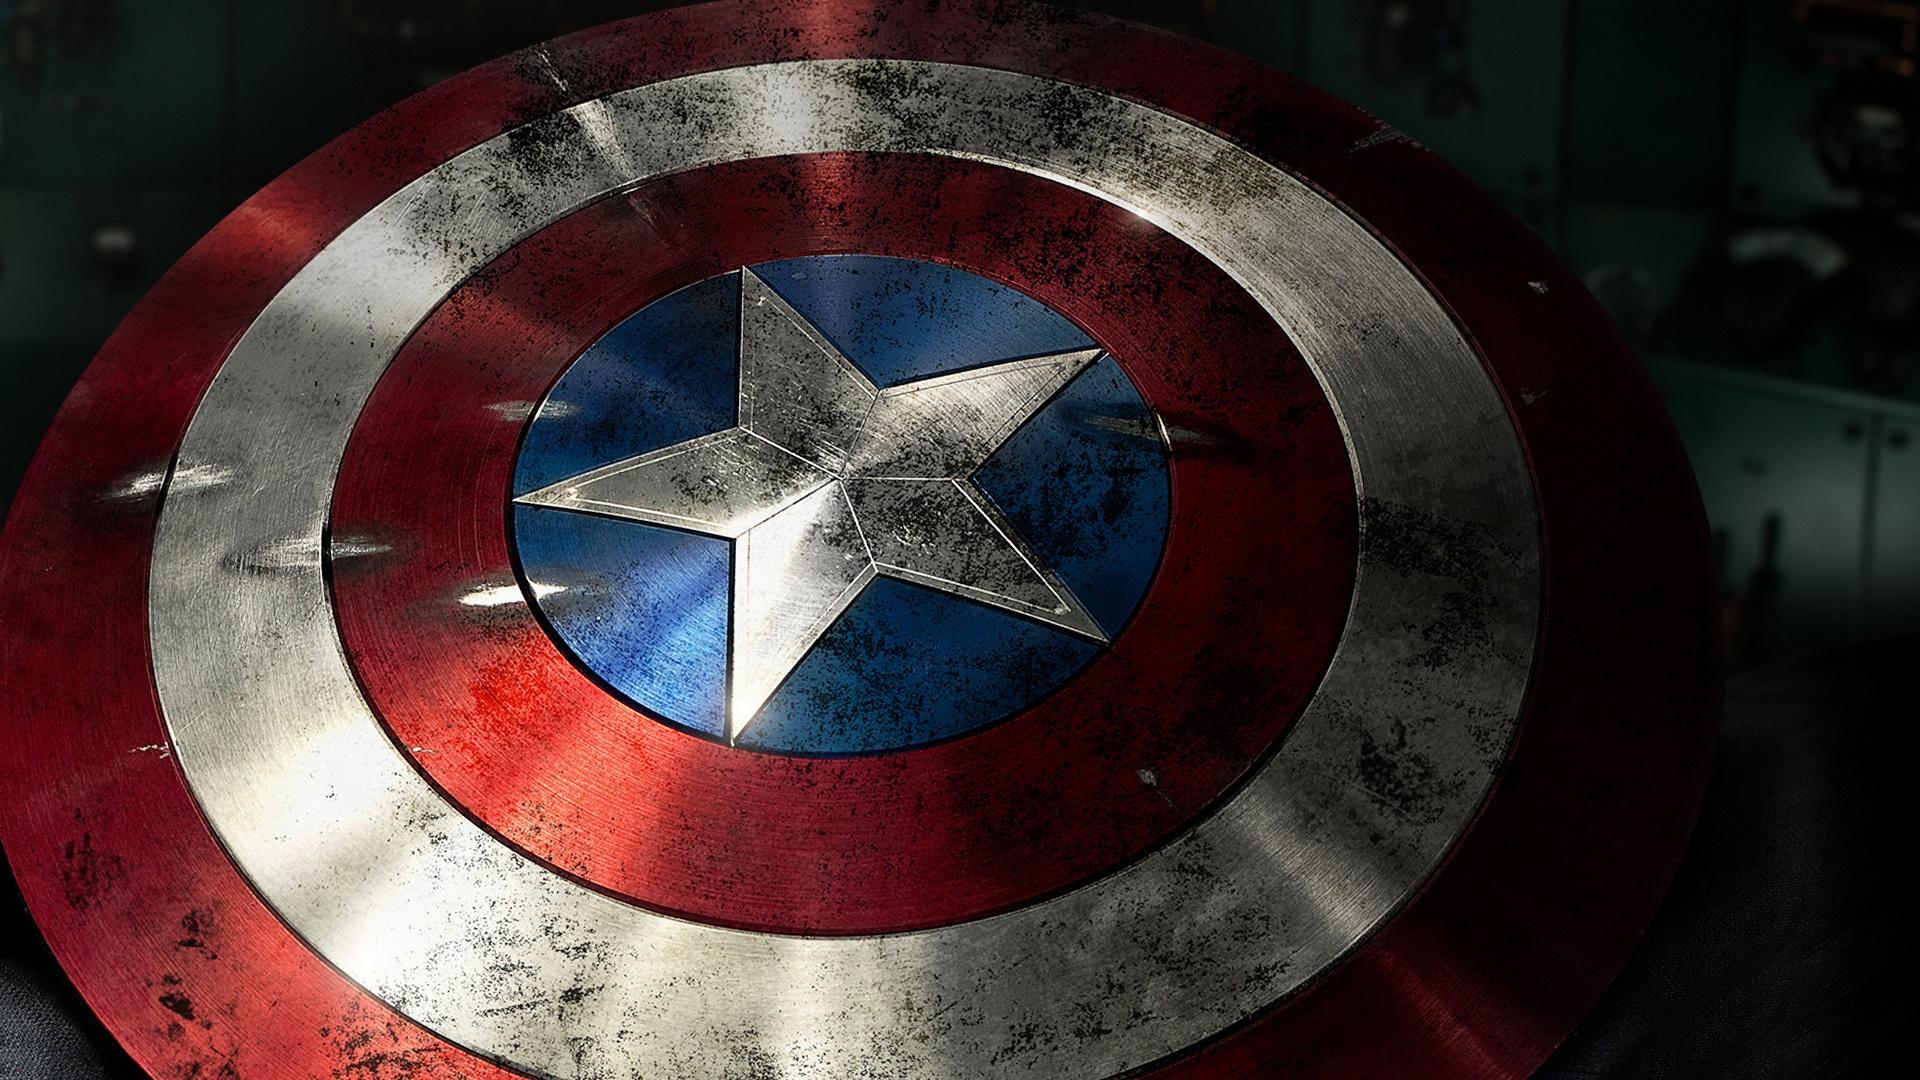 Captain america shield full hd wallpaper and background image 1920x1080 id 273680 - Image captain america ...